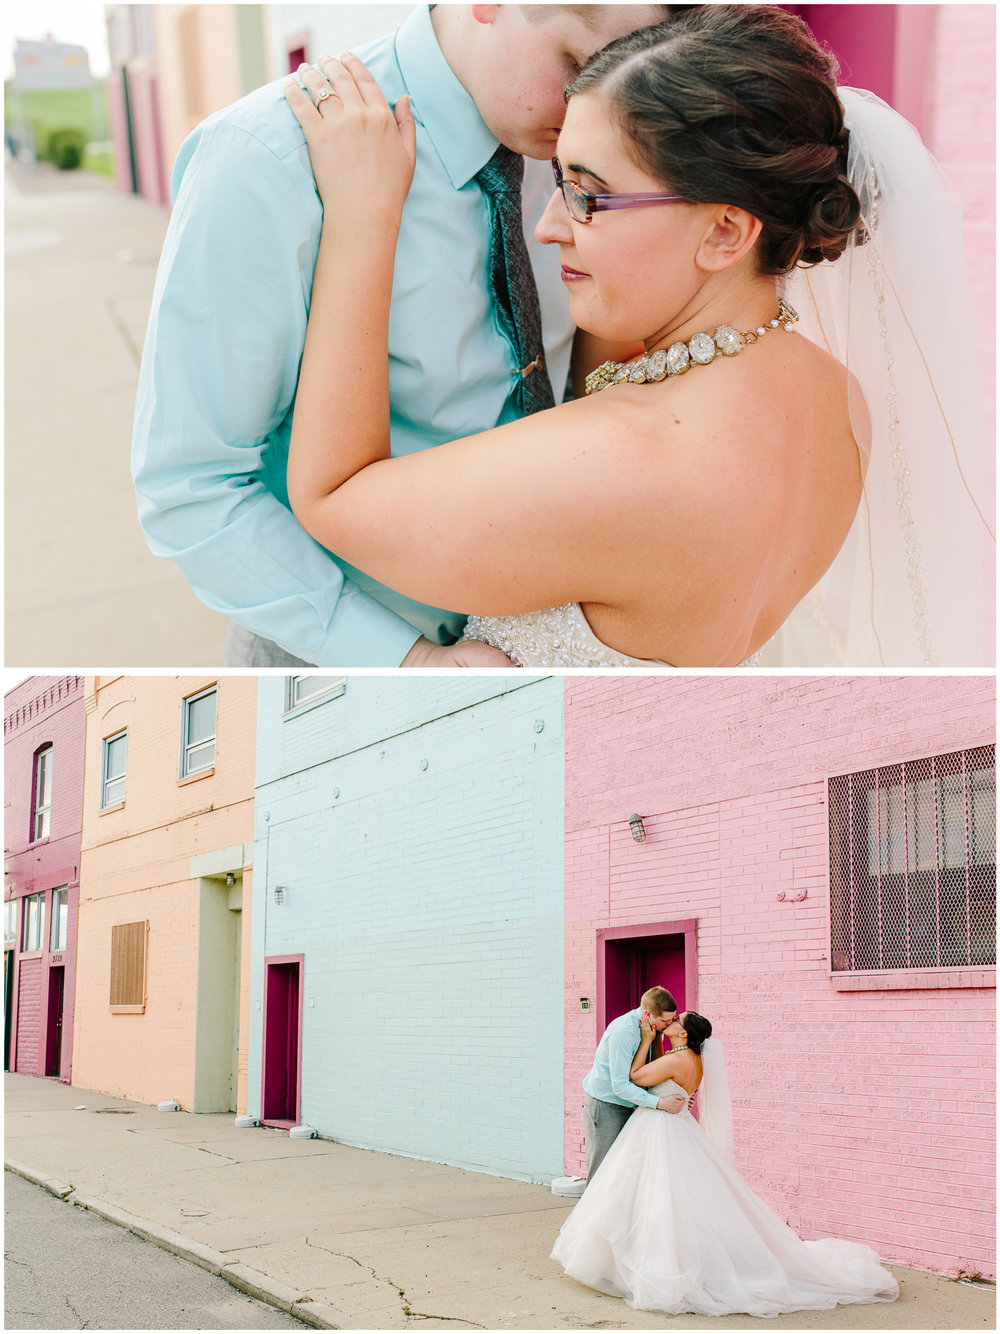 downtowndenverwedding_44.jpg